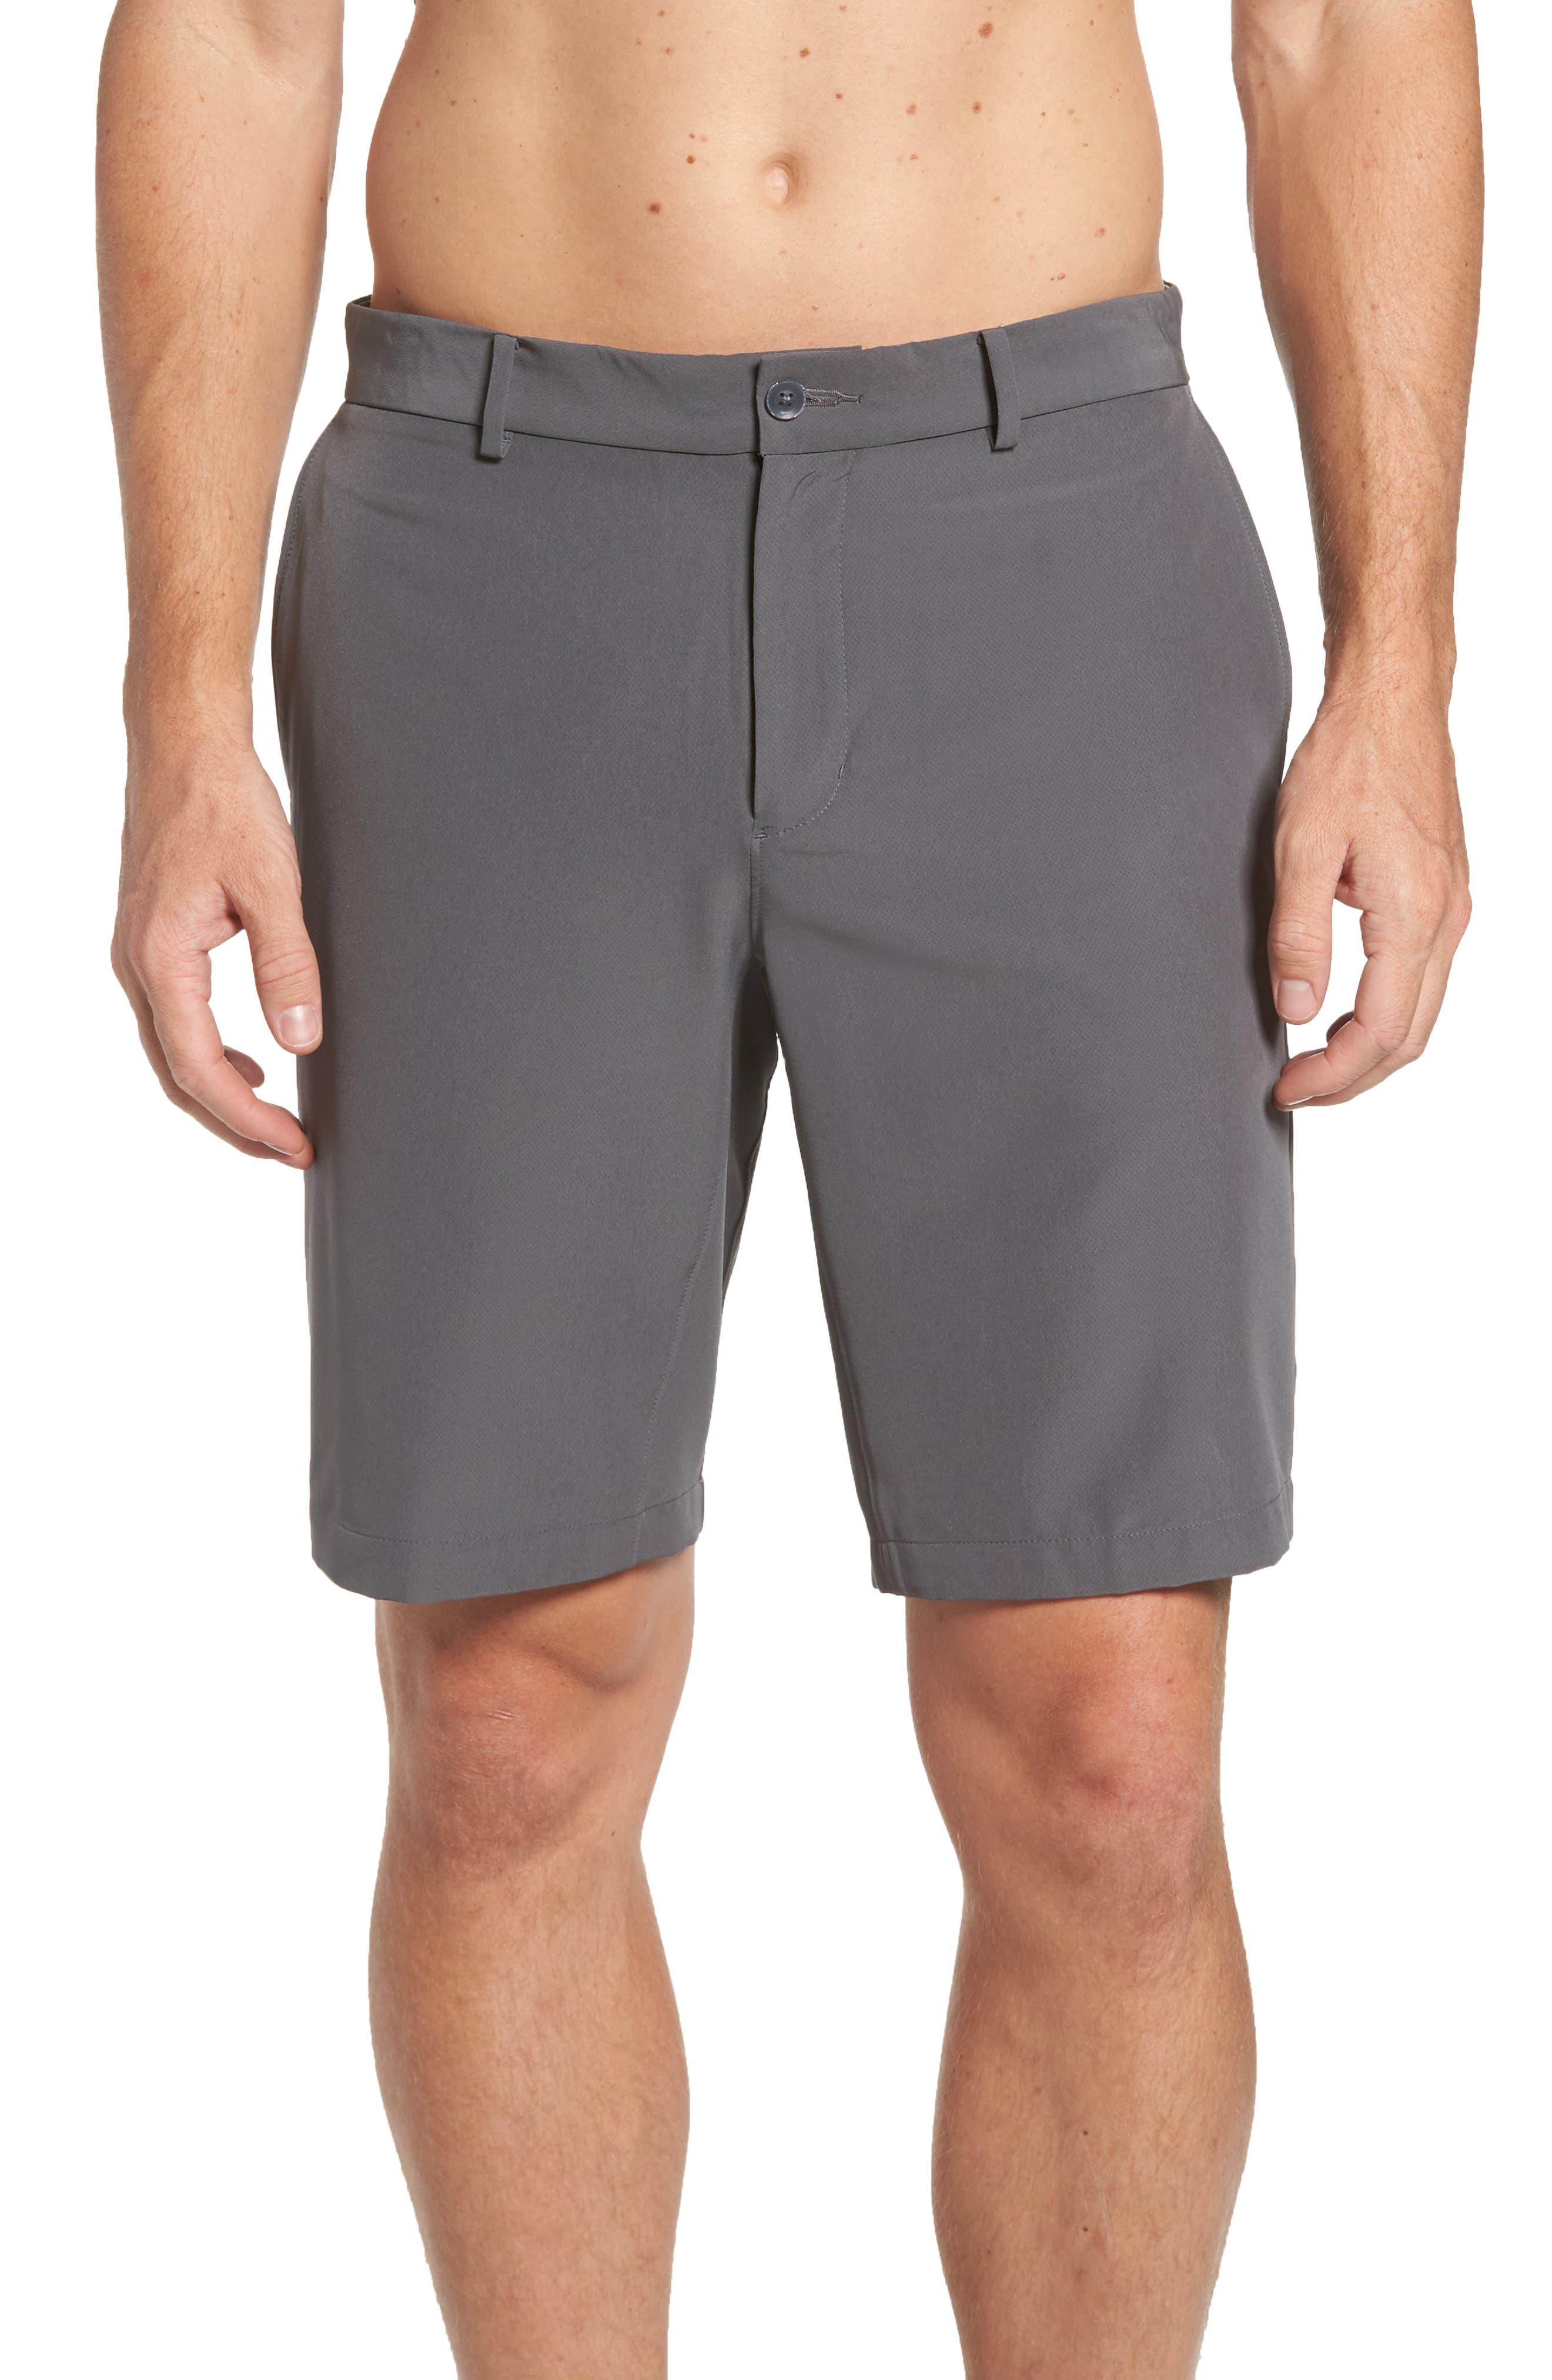 Hybrid Flex Golf Shorts,                             Alternate thumbnail 2, color,                             Dark Grey/ Black